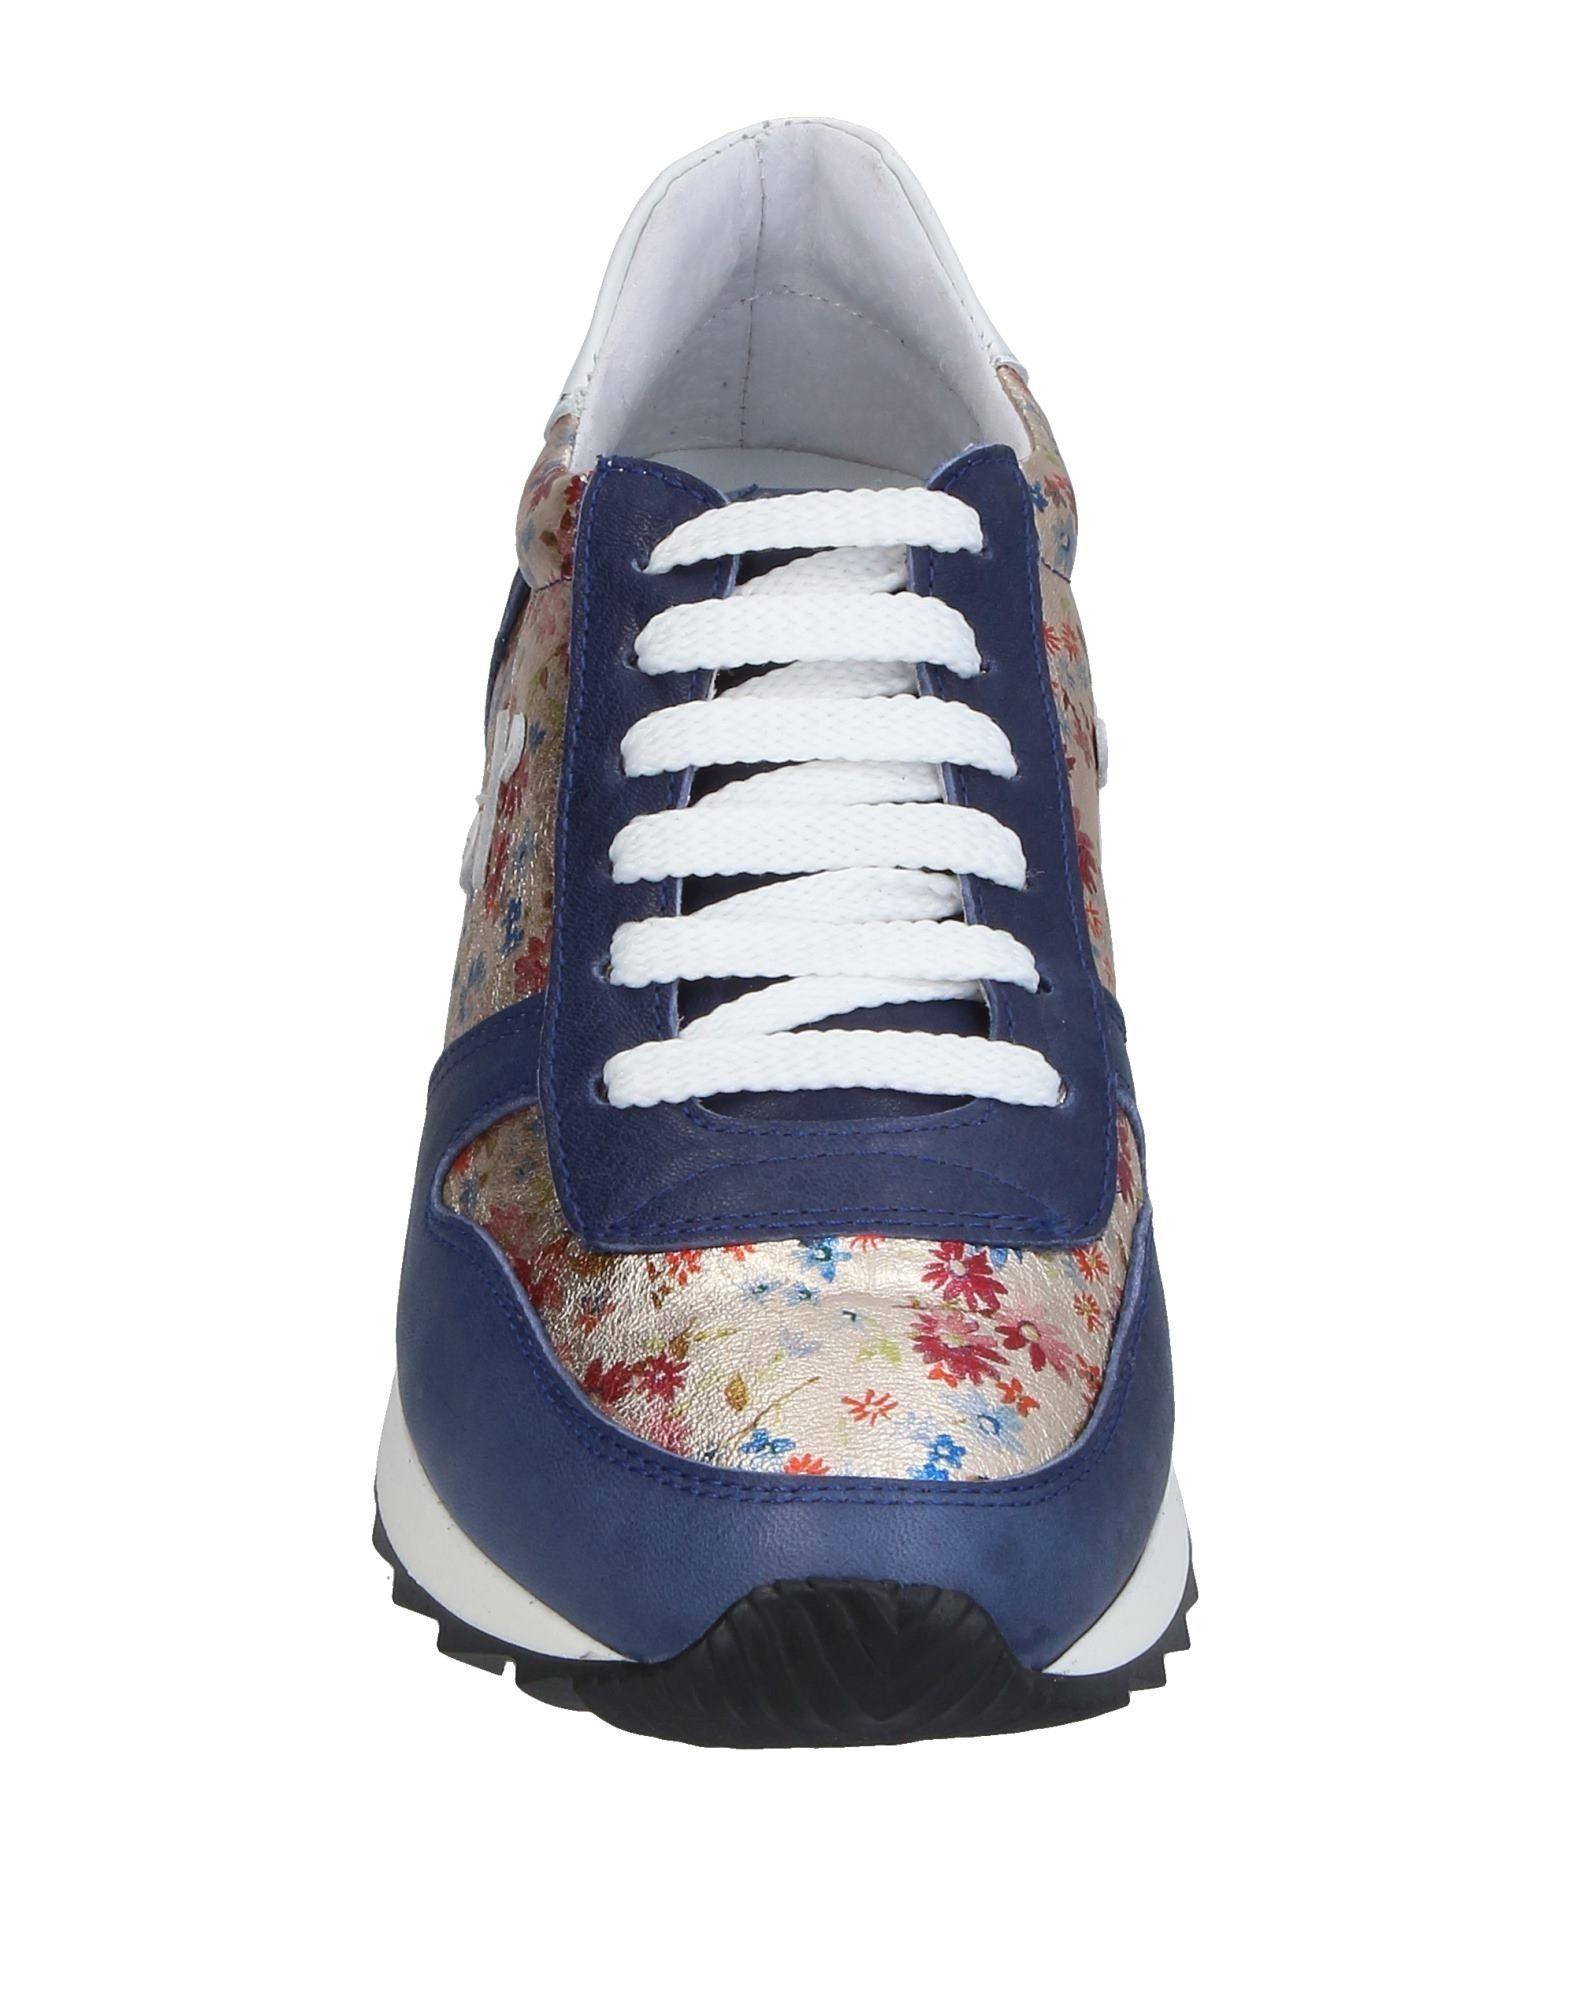 Oroscuro Sneakers Sneakers Oroscuro Damen  11376138ES fec1e2